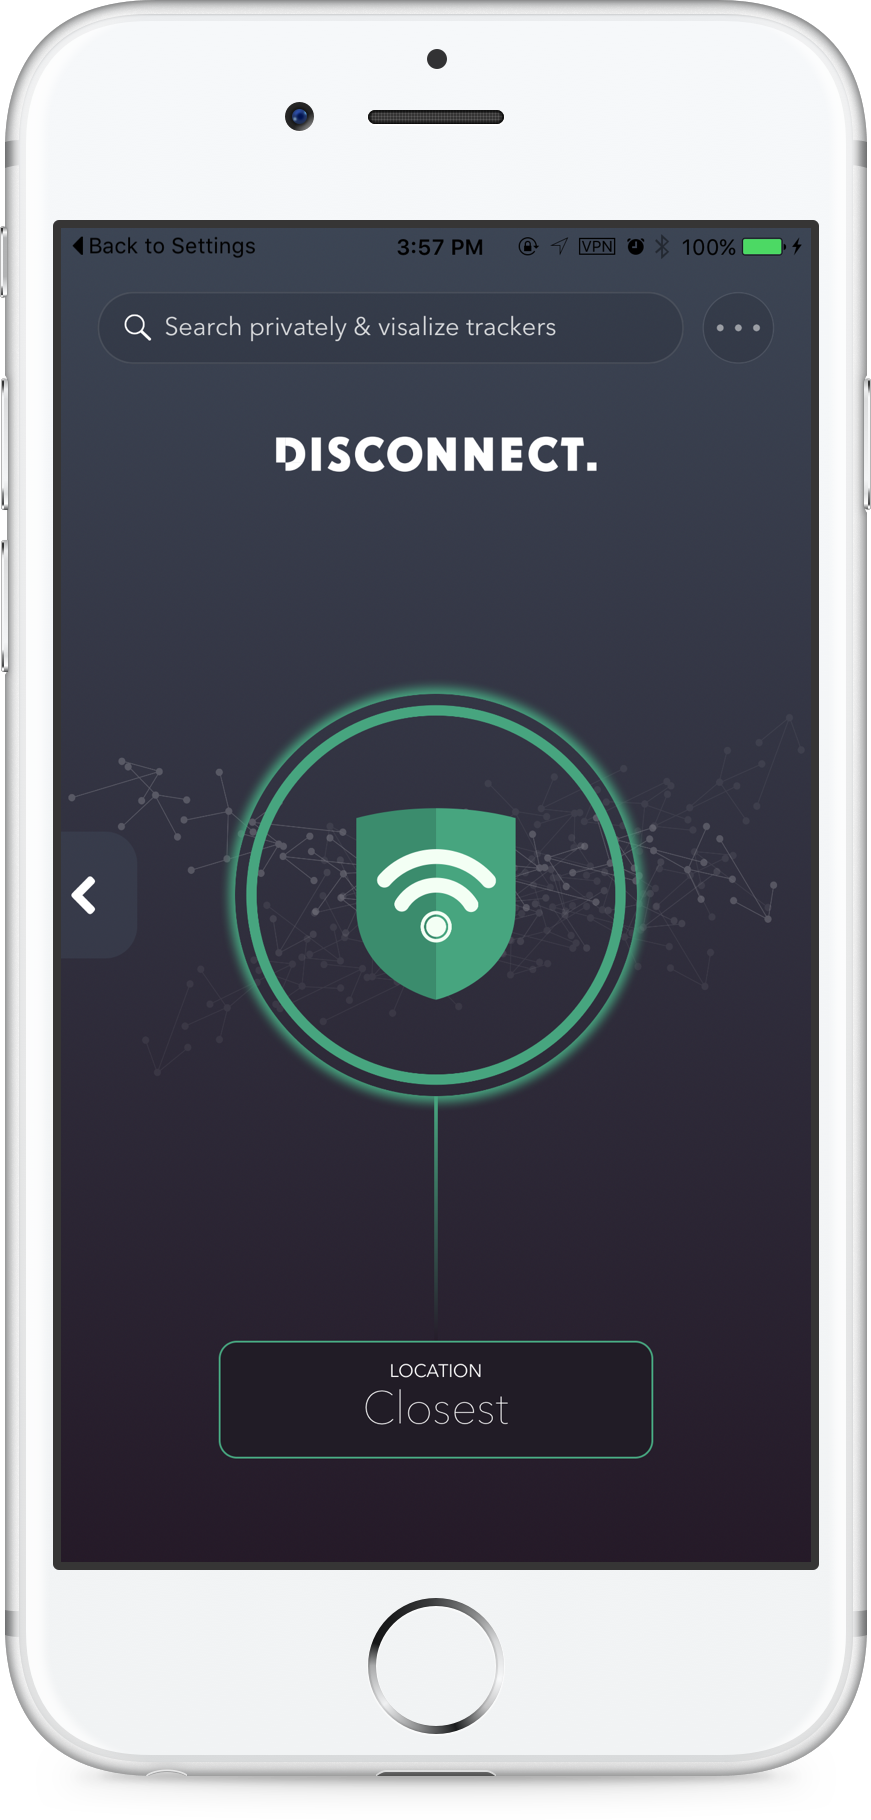 a1c3e1fd9ec49b4c40418404bc9ec4f6 - How To Stop Vpn From Disconnecting Iphone